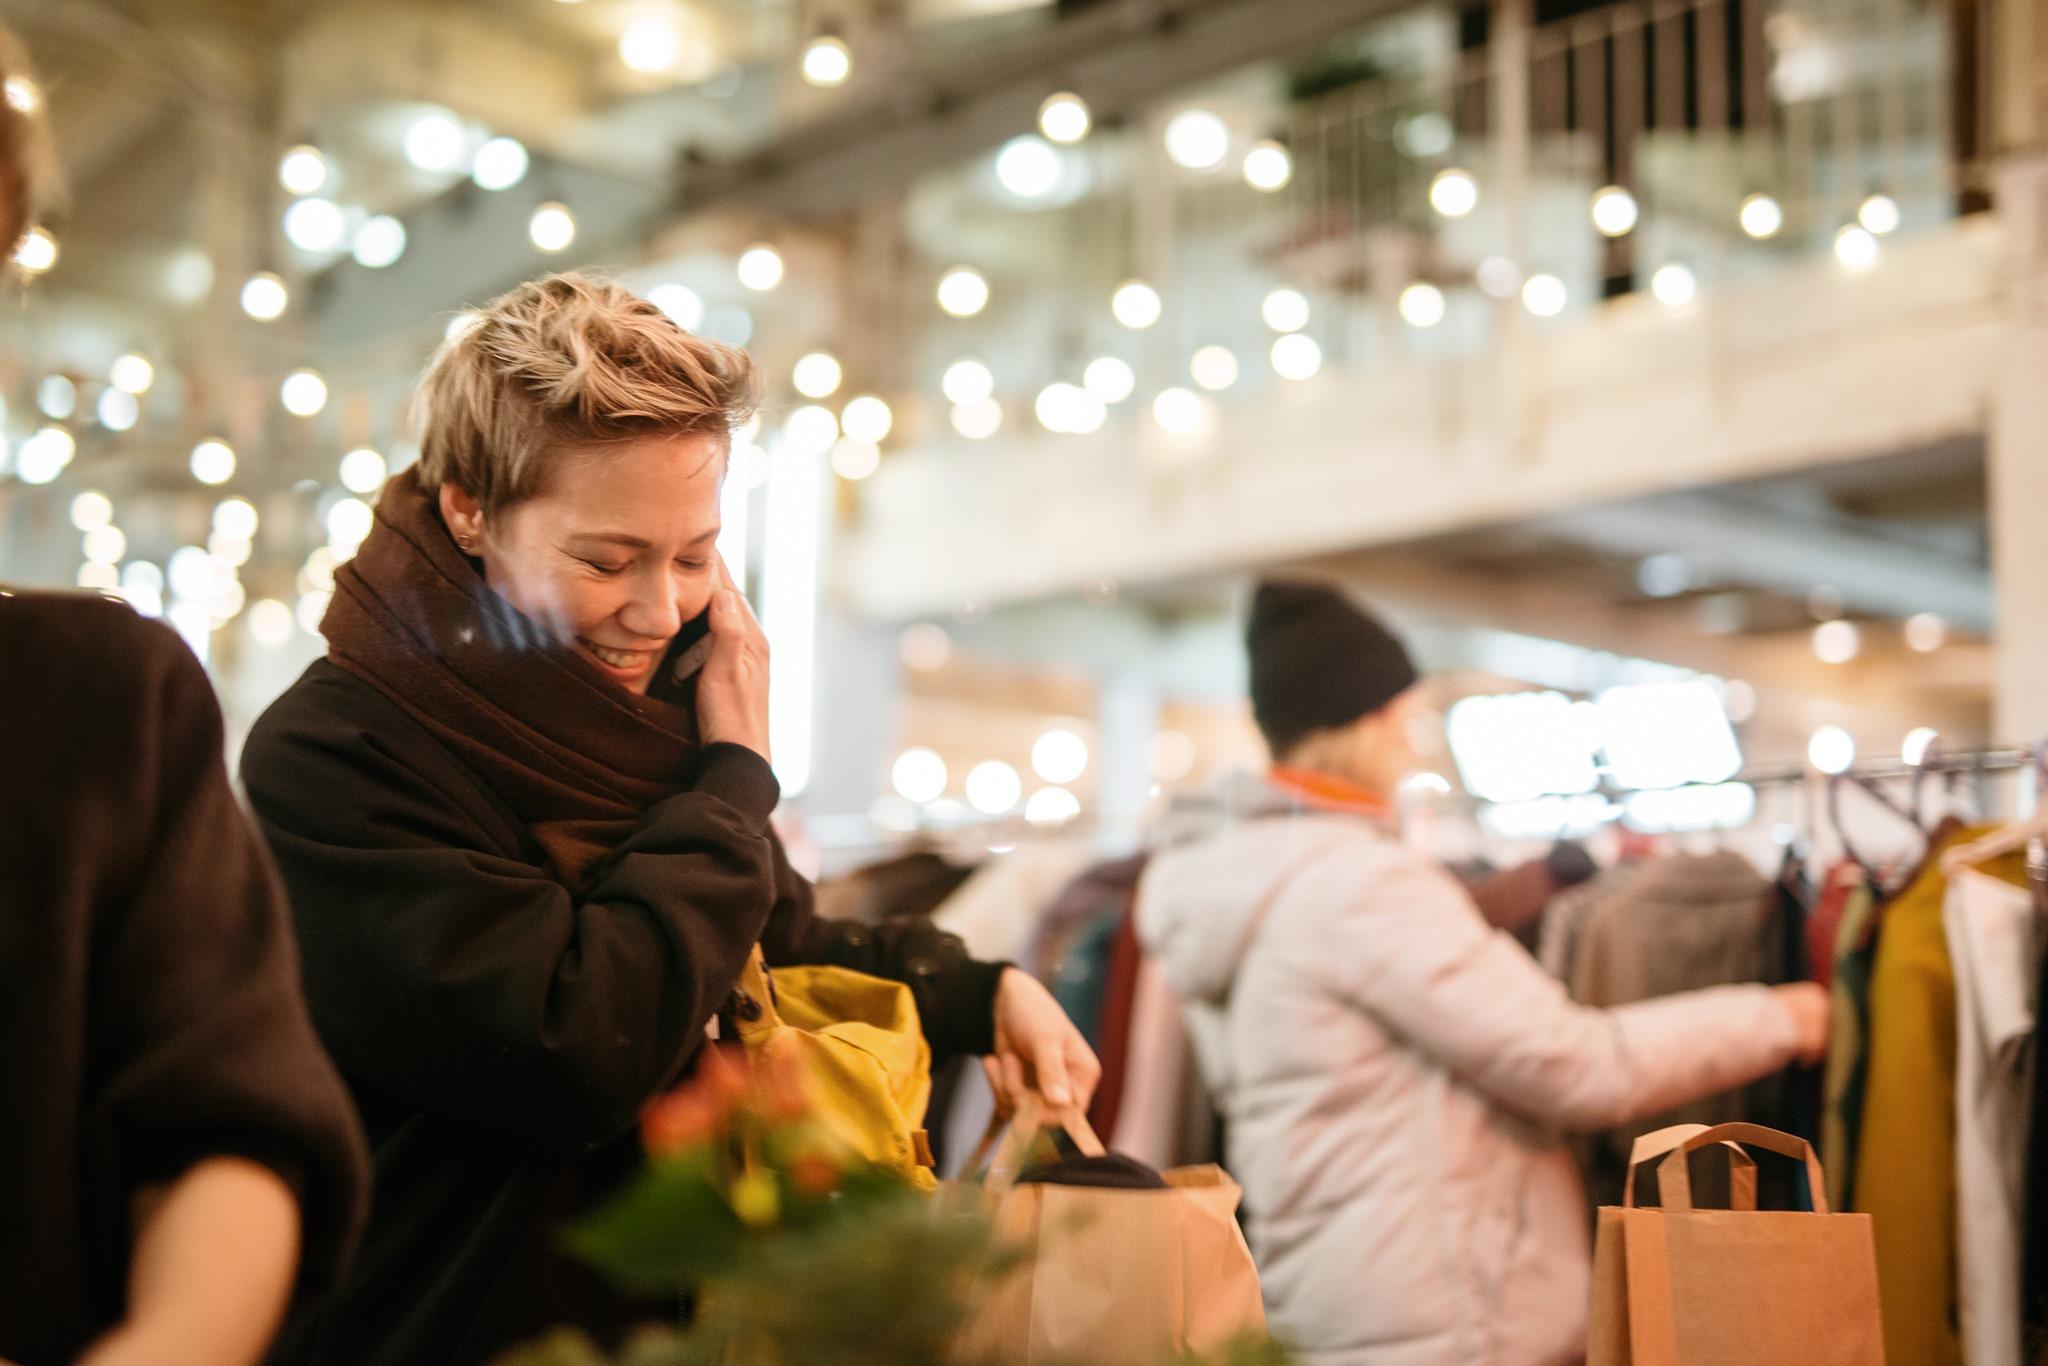 Авито теперь оффлайн: Эскимо garage sale